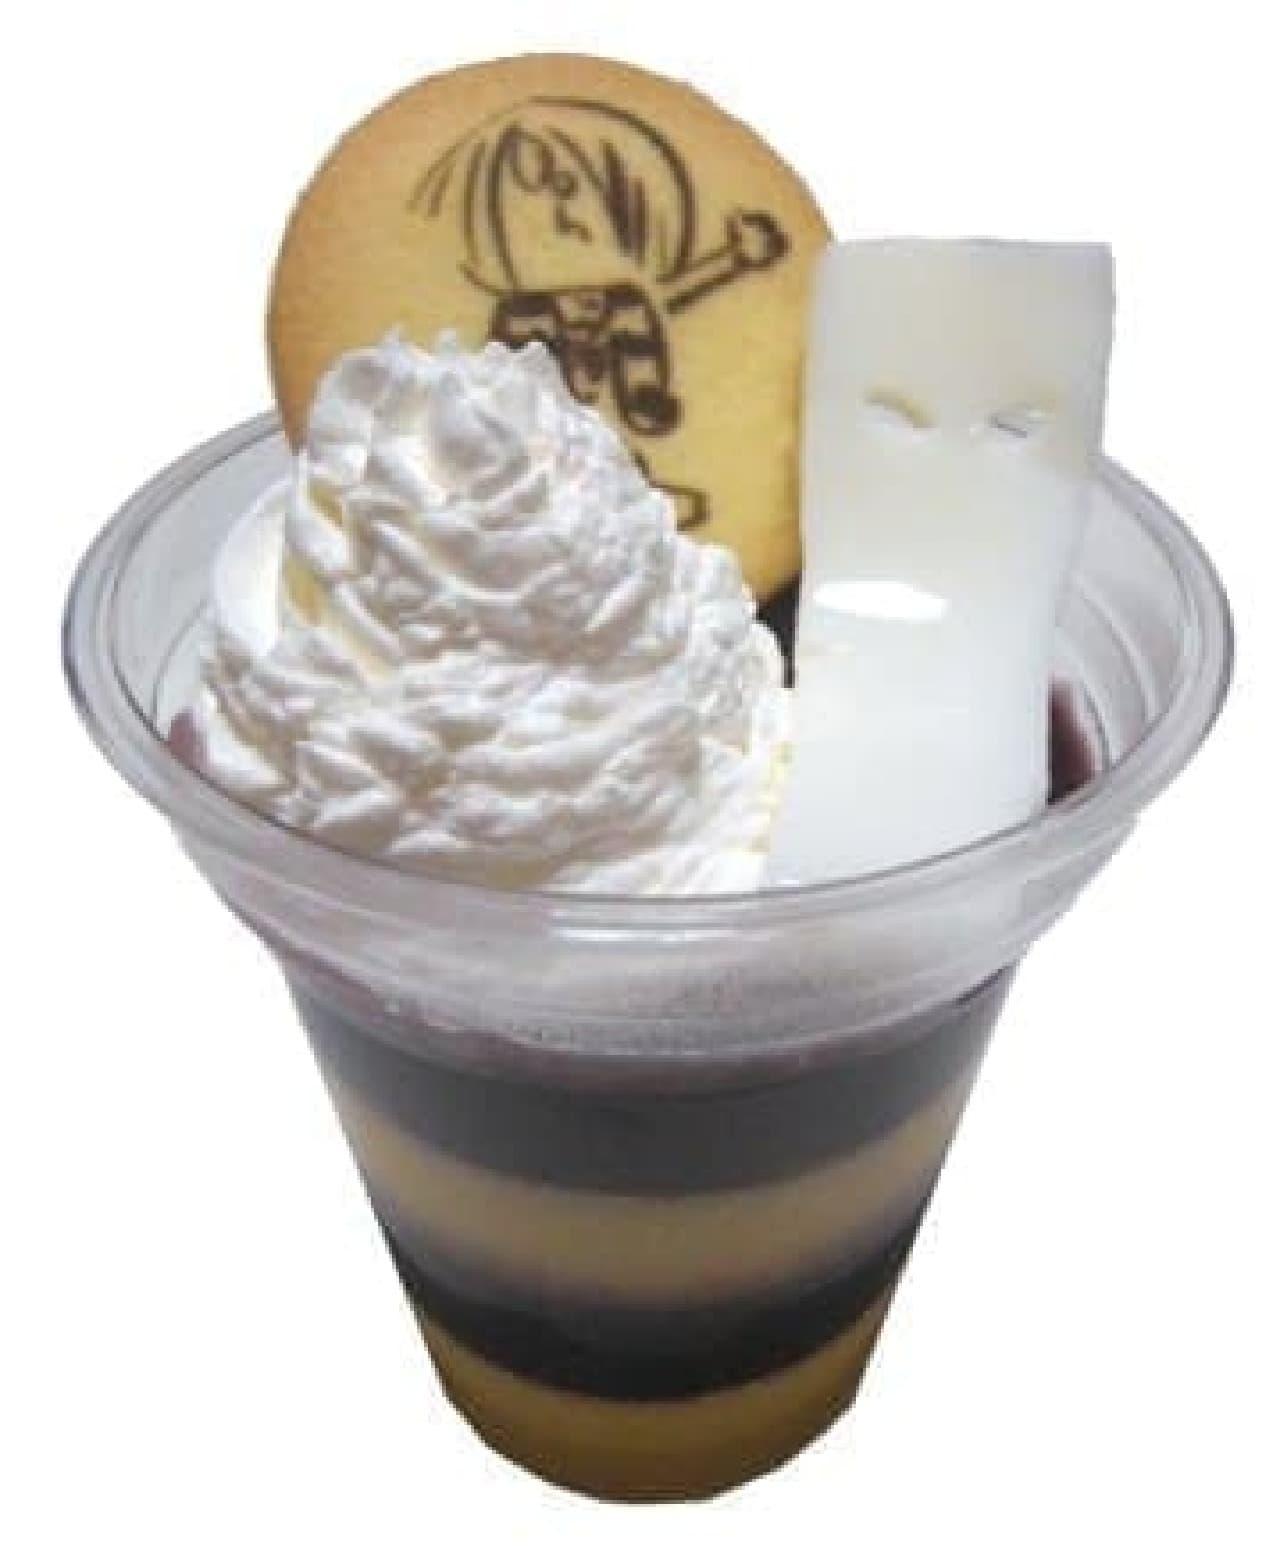 GeGeGeの氷怪堂「鬼太郎パフェ」